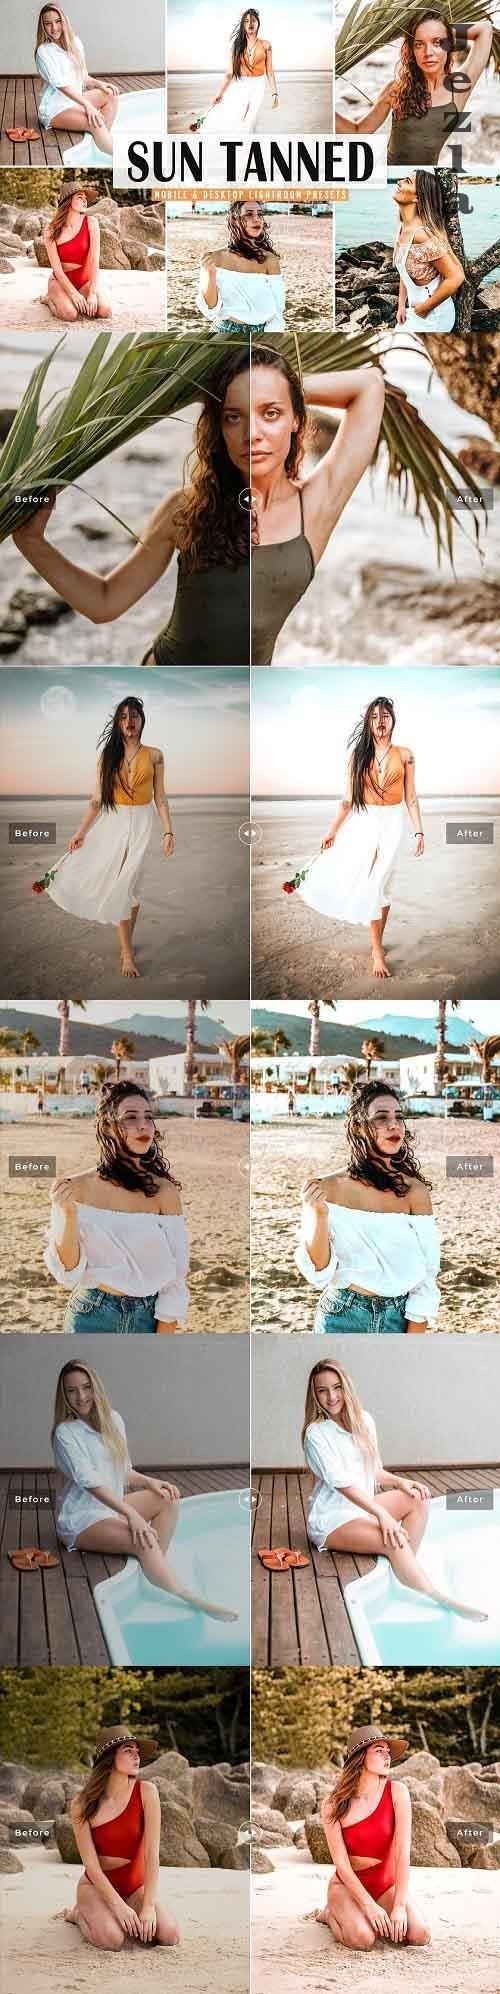 CreativeMarket - Sun Tanned Pro Lightroom Presets - 5498516 - Mobile & Desktop